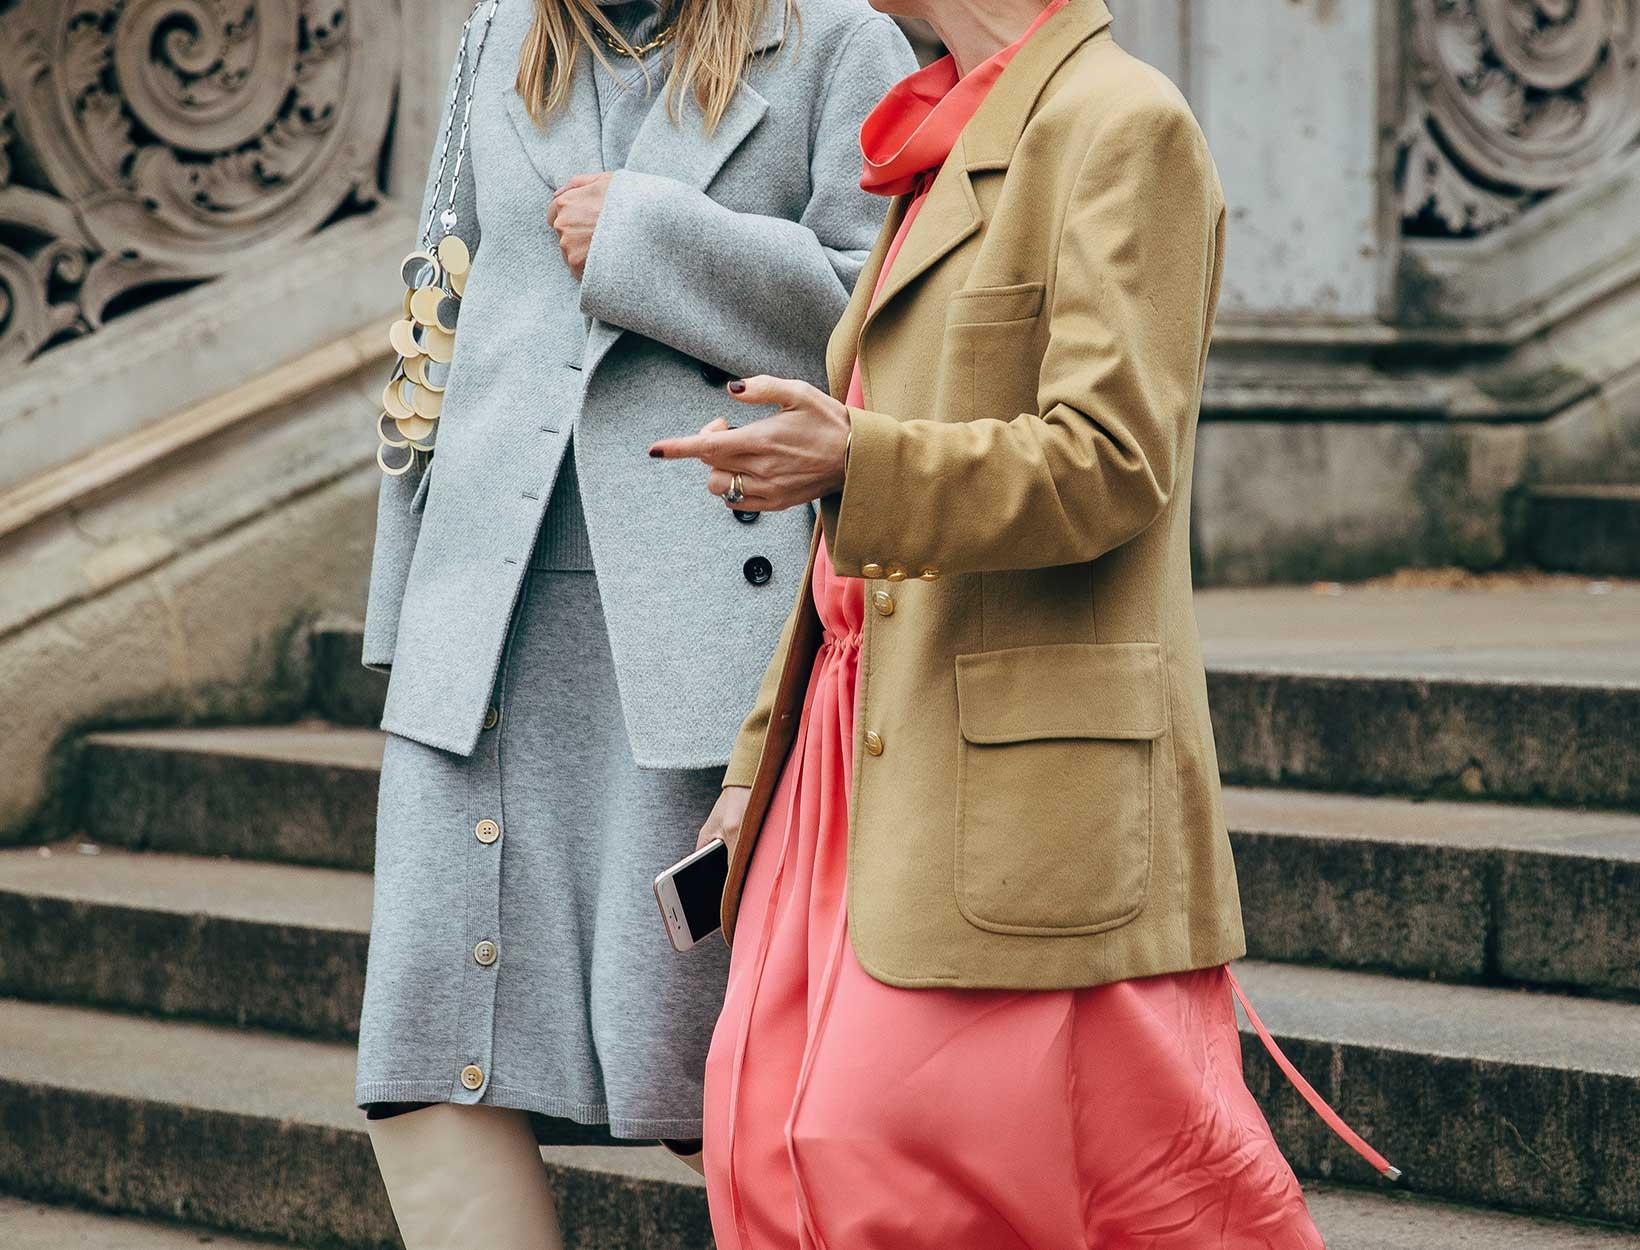 women wearing oversized coats